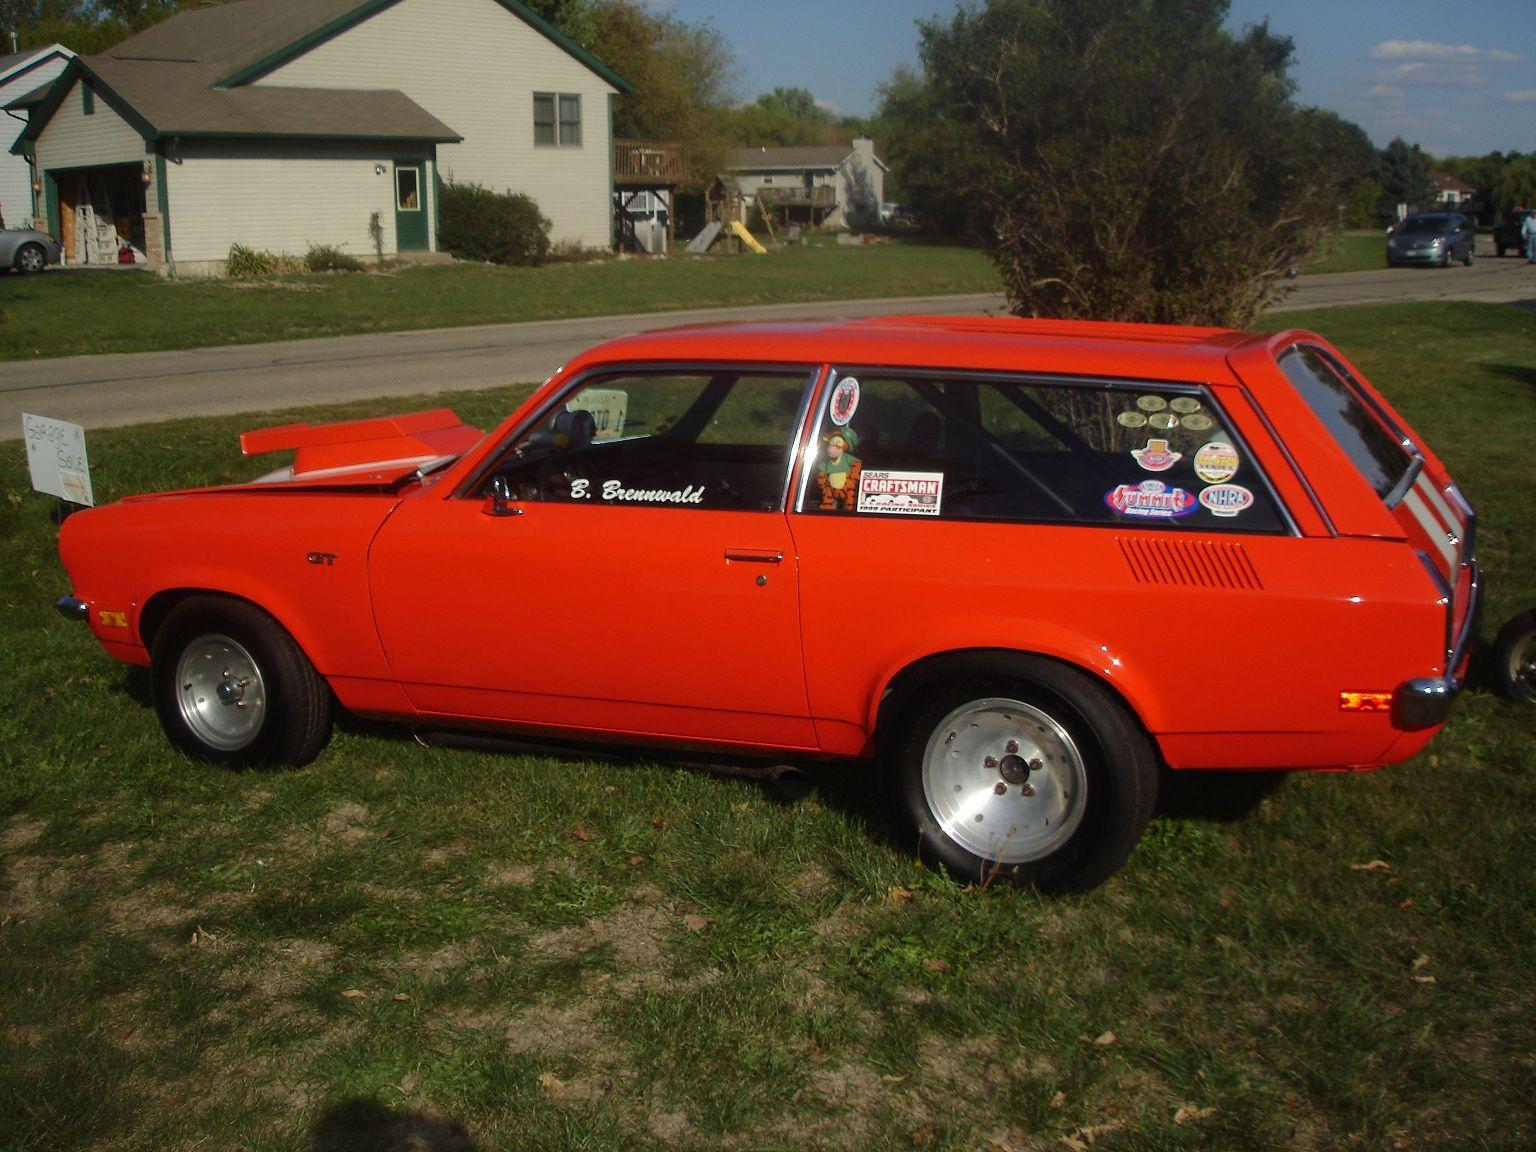 All Chevy 74 chevy vega gt : 1972 Chevy Vega   AutoTrader Classics - 1972 Chevrolet Vega Wagon ...